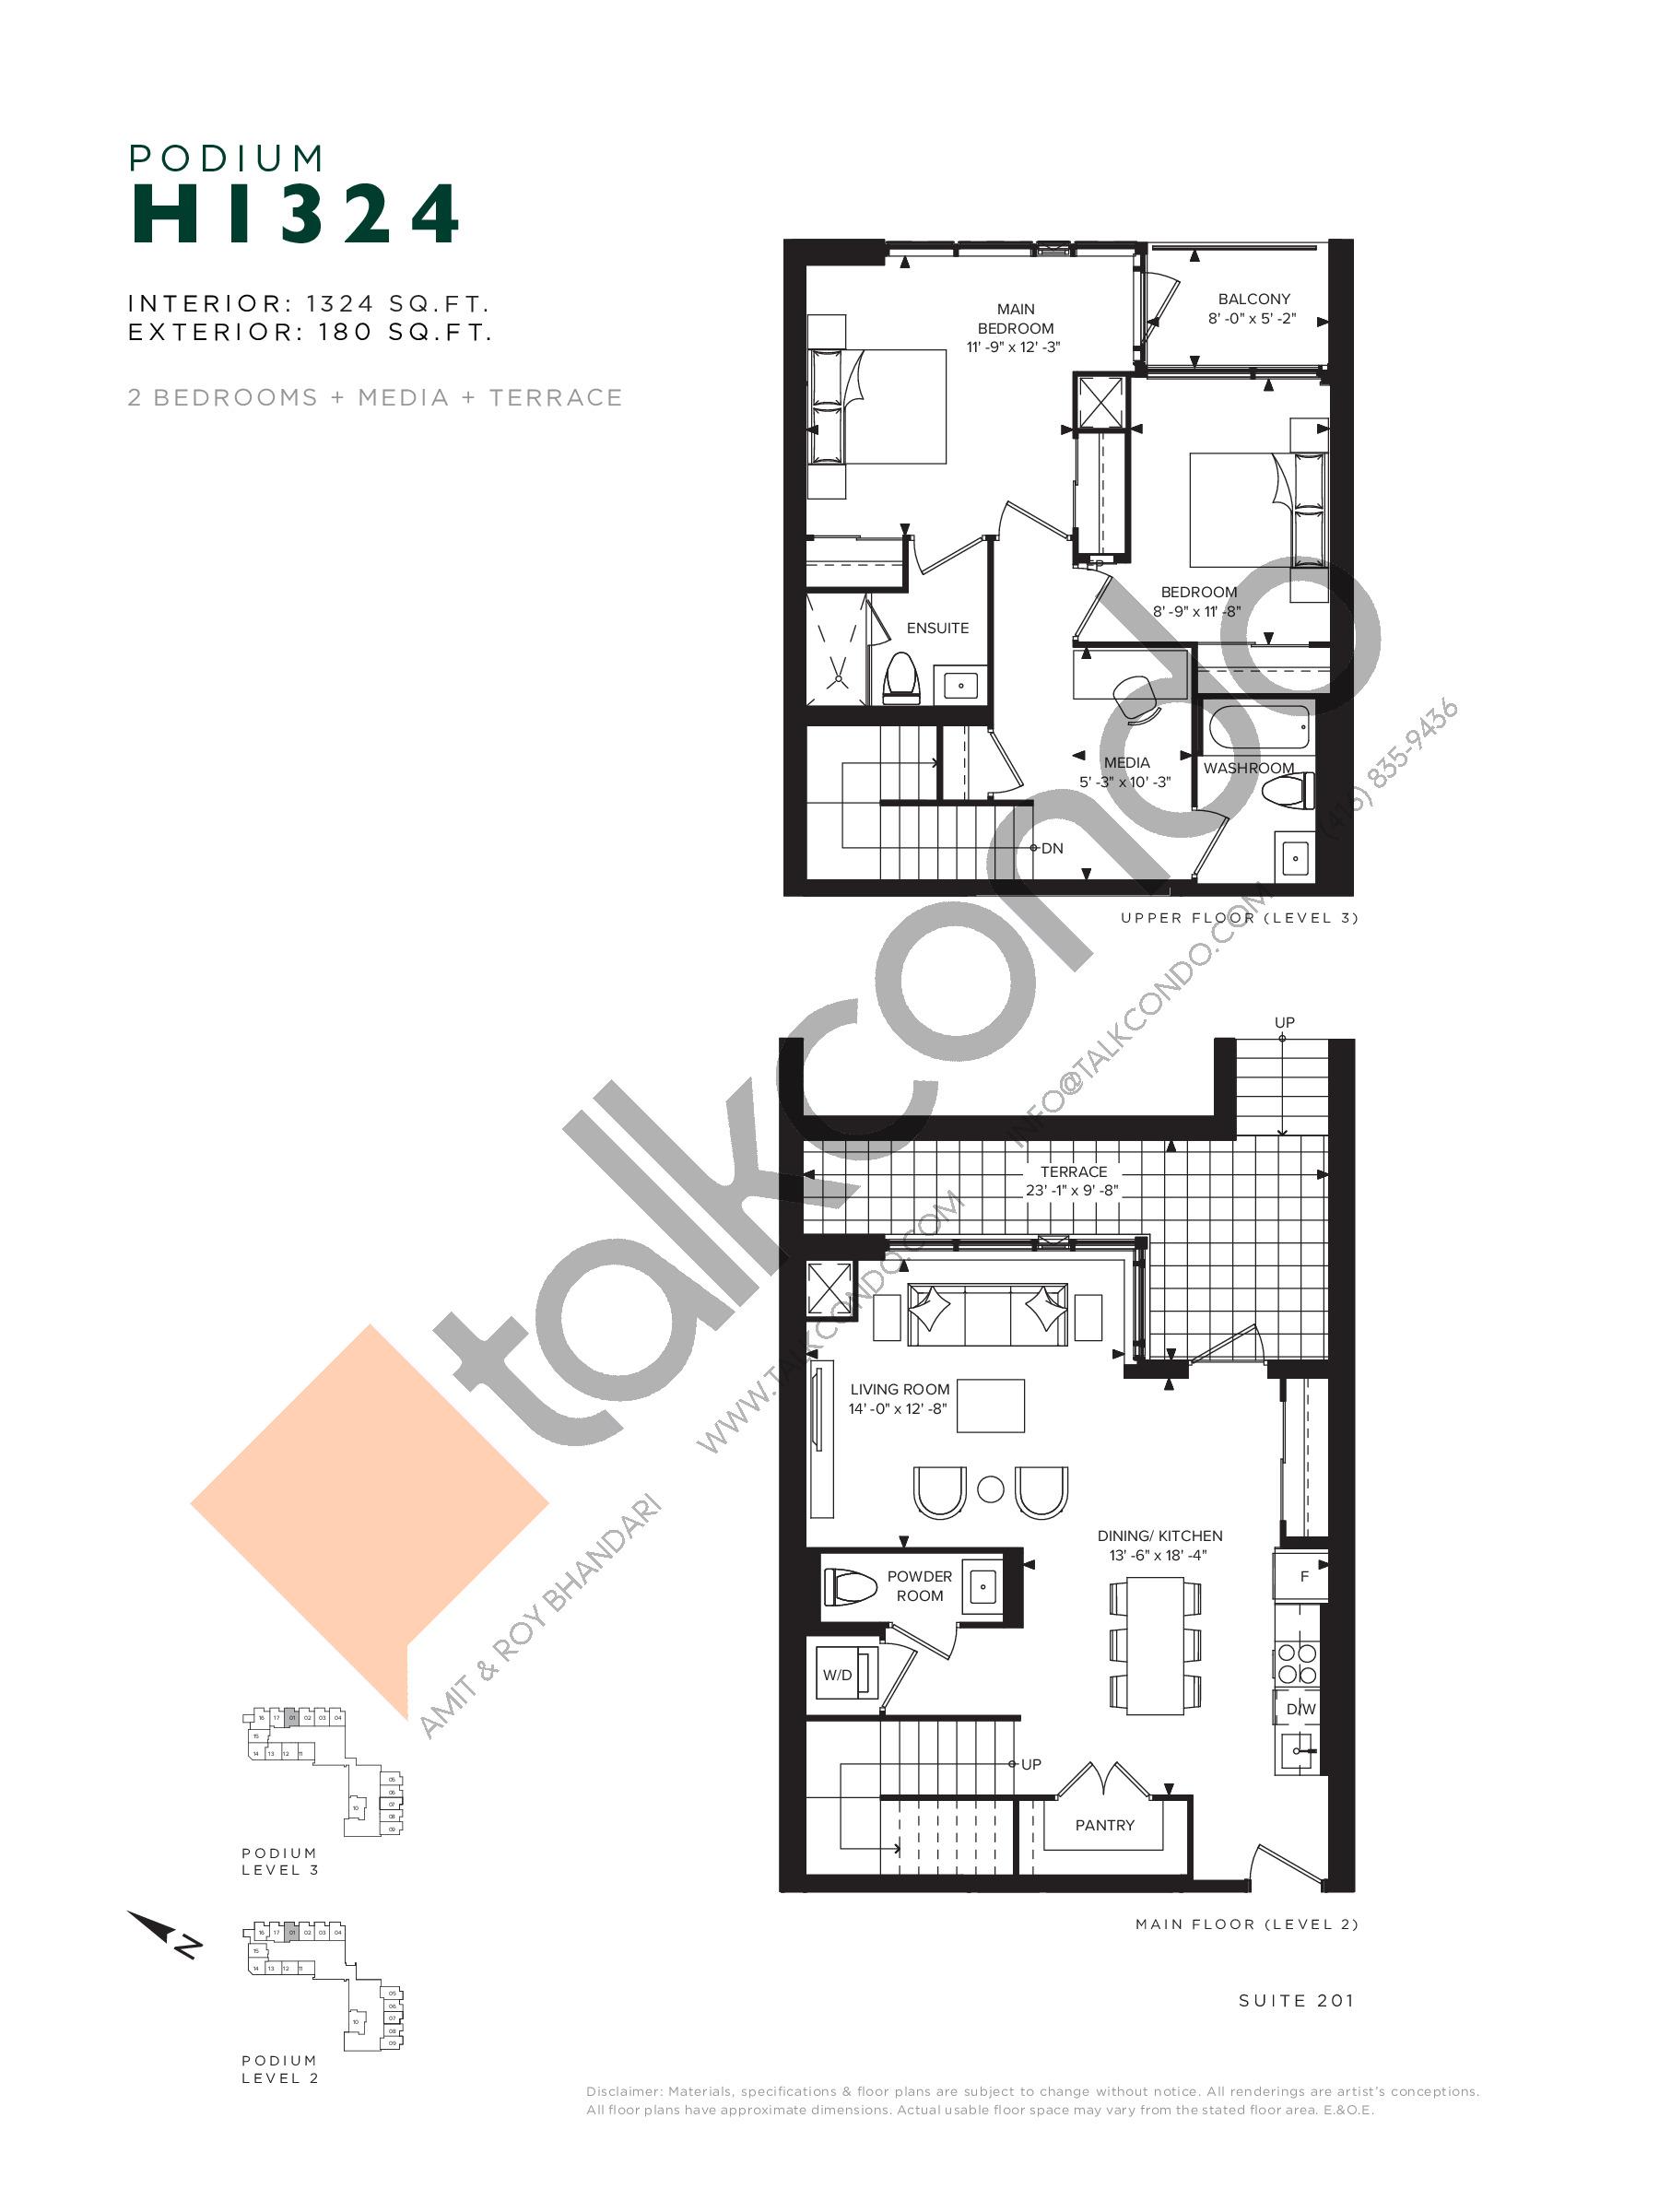 H1324 (Podium) Floor Plan at Hillmont at SXSW Condos - 1324 sq.ft